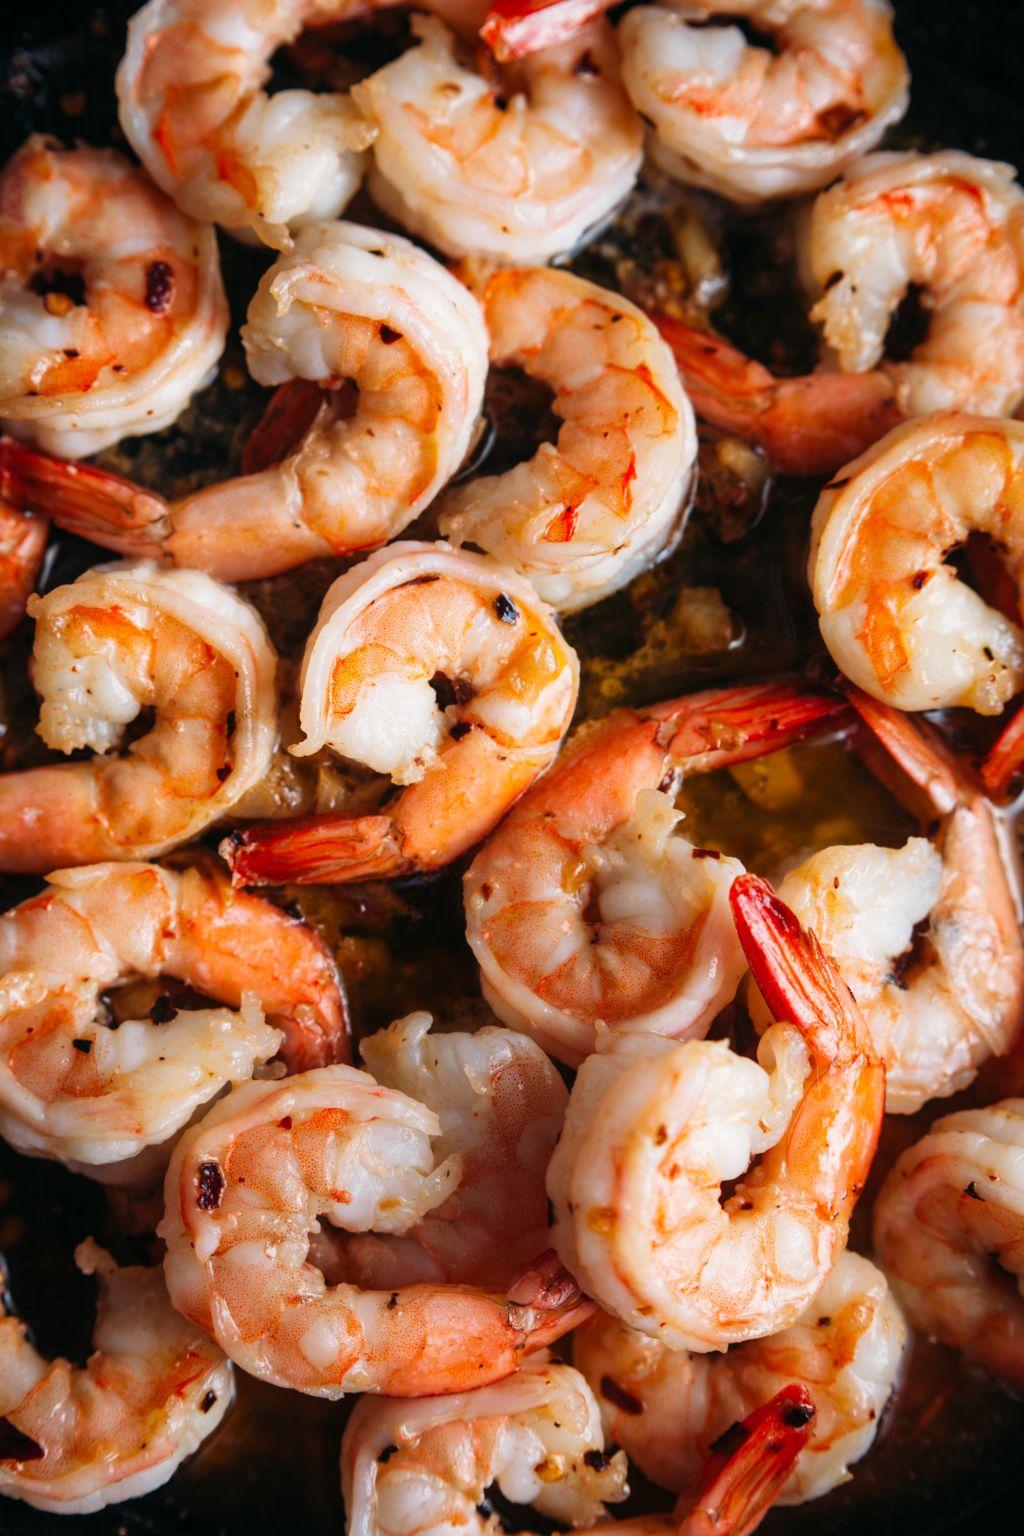 Shrimp with Lemon and Garlic Sauce - Tastemaker Blog